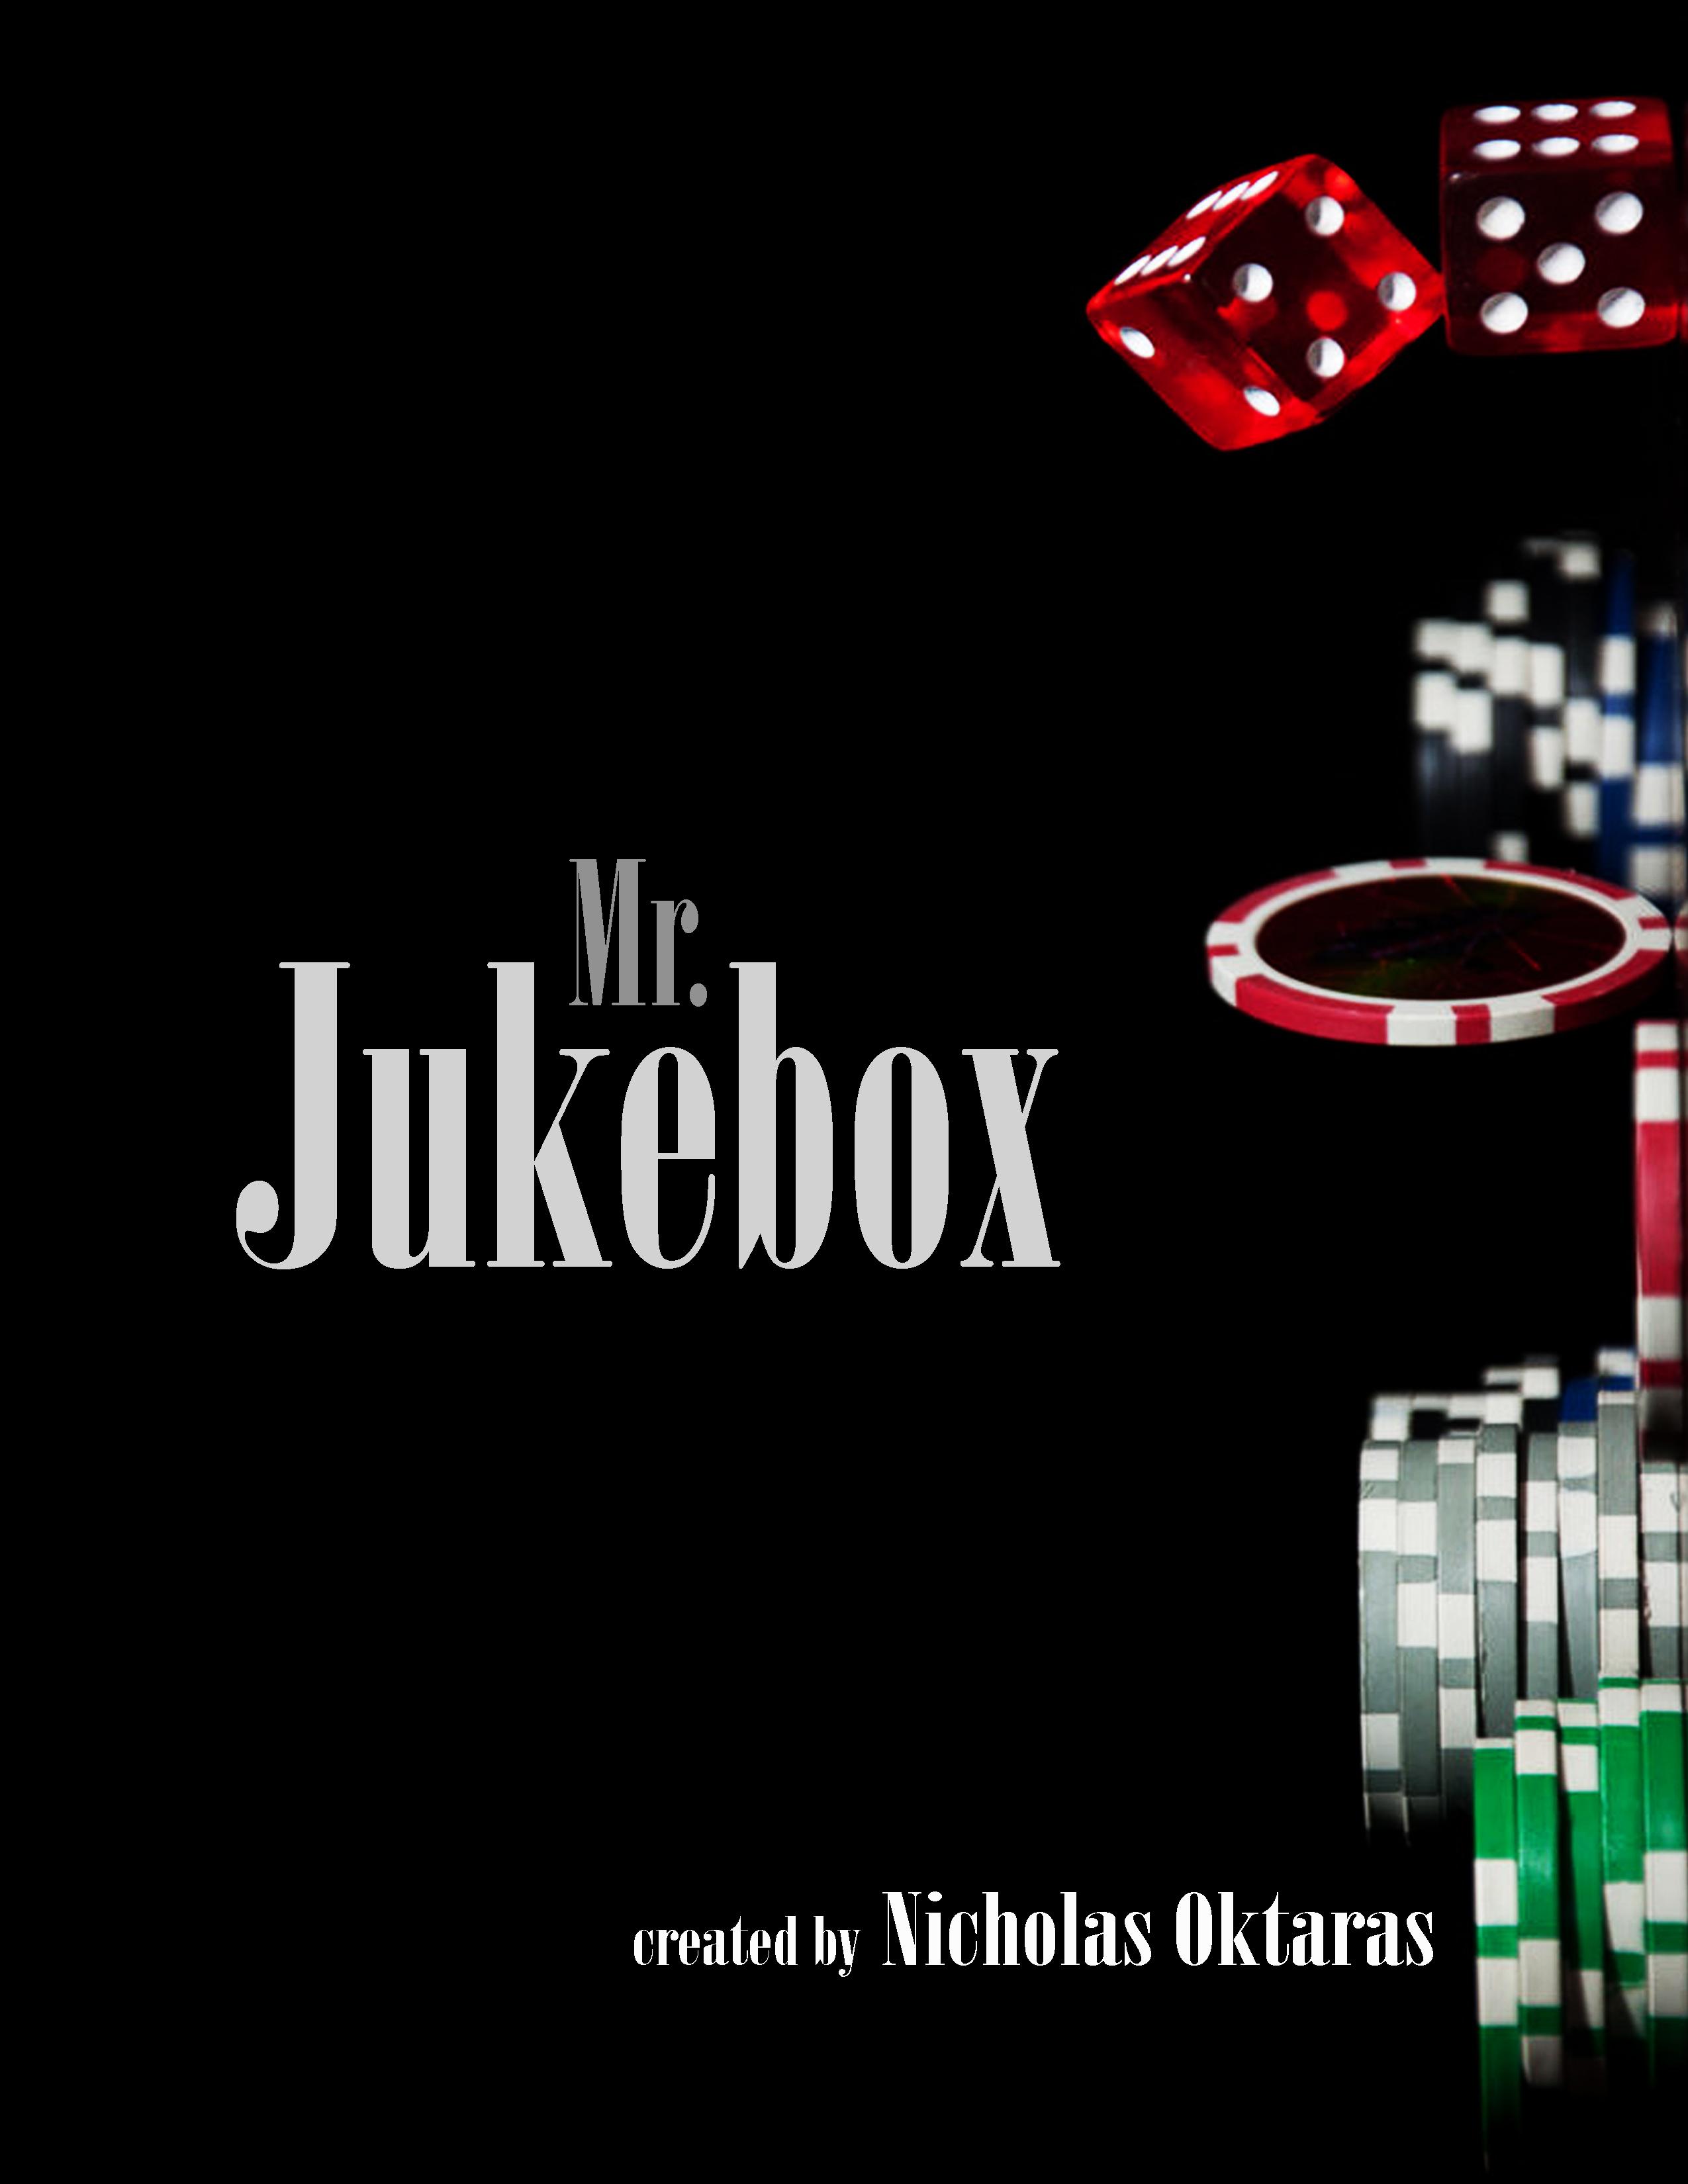 Mr Jukebox TV Show written and created by Nicholas Oktaras